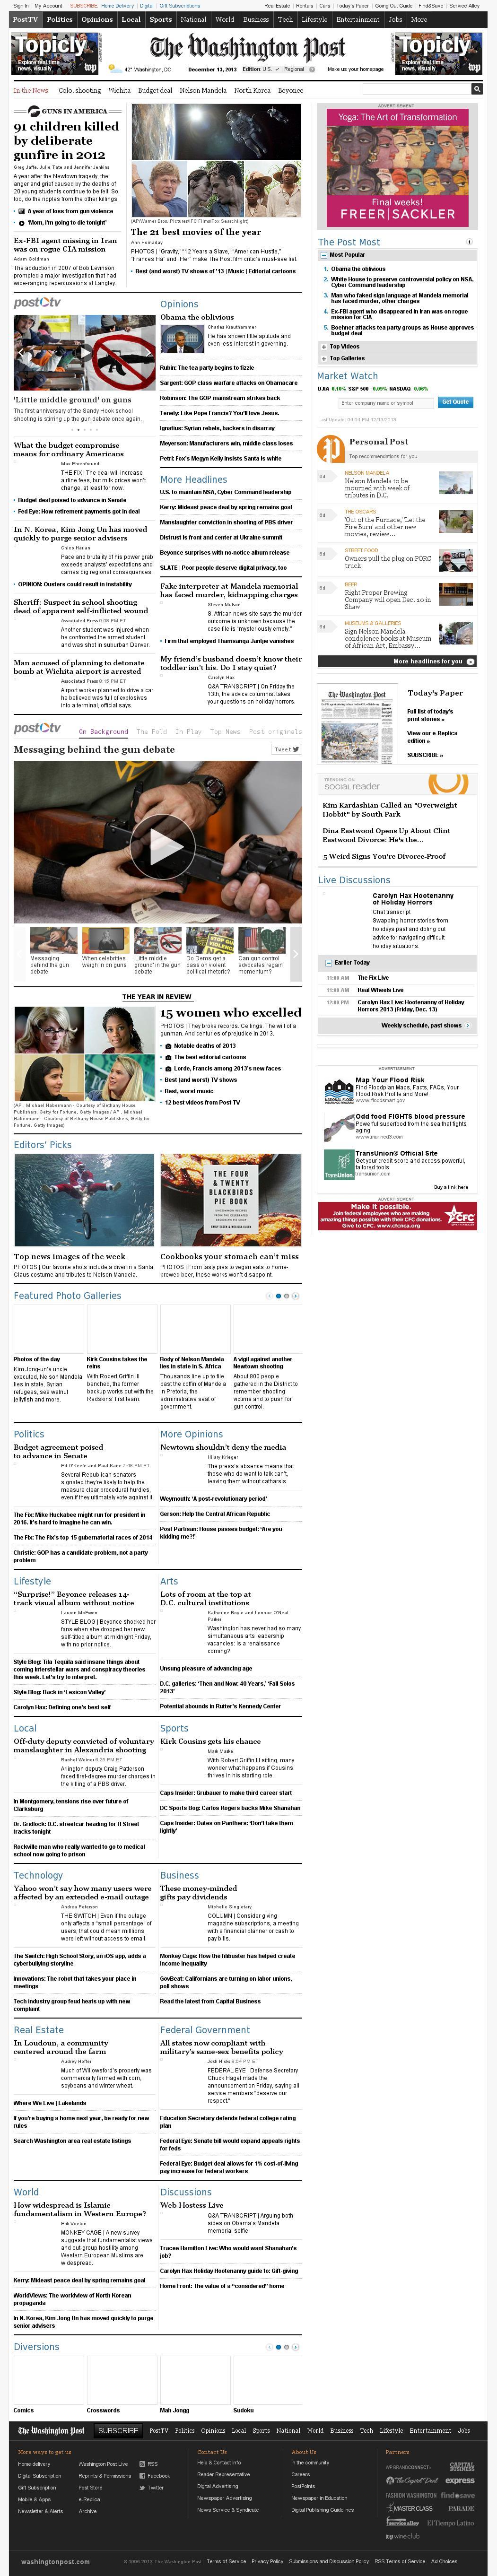 The Washington Post at Friday Dec. 13, 2013, 9:18 p.m. UTC